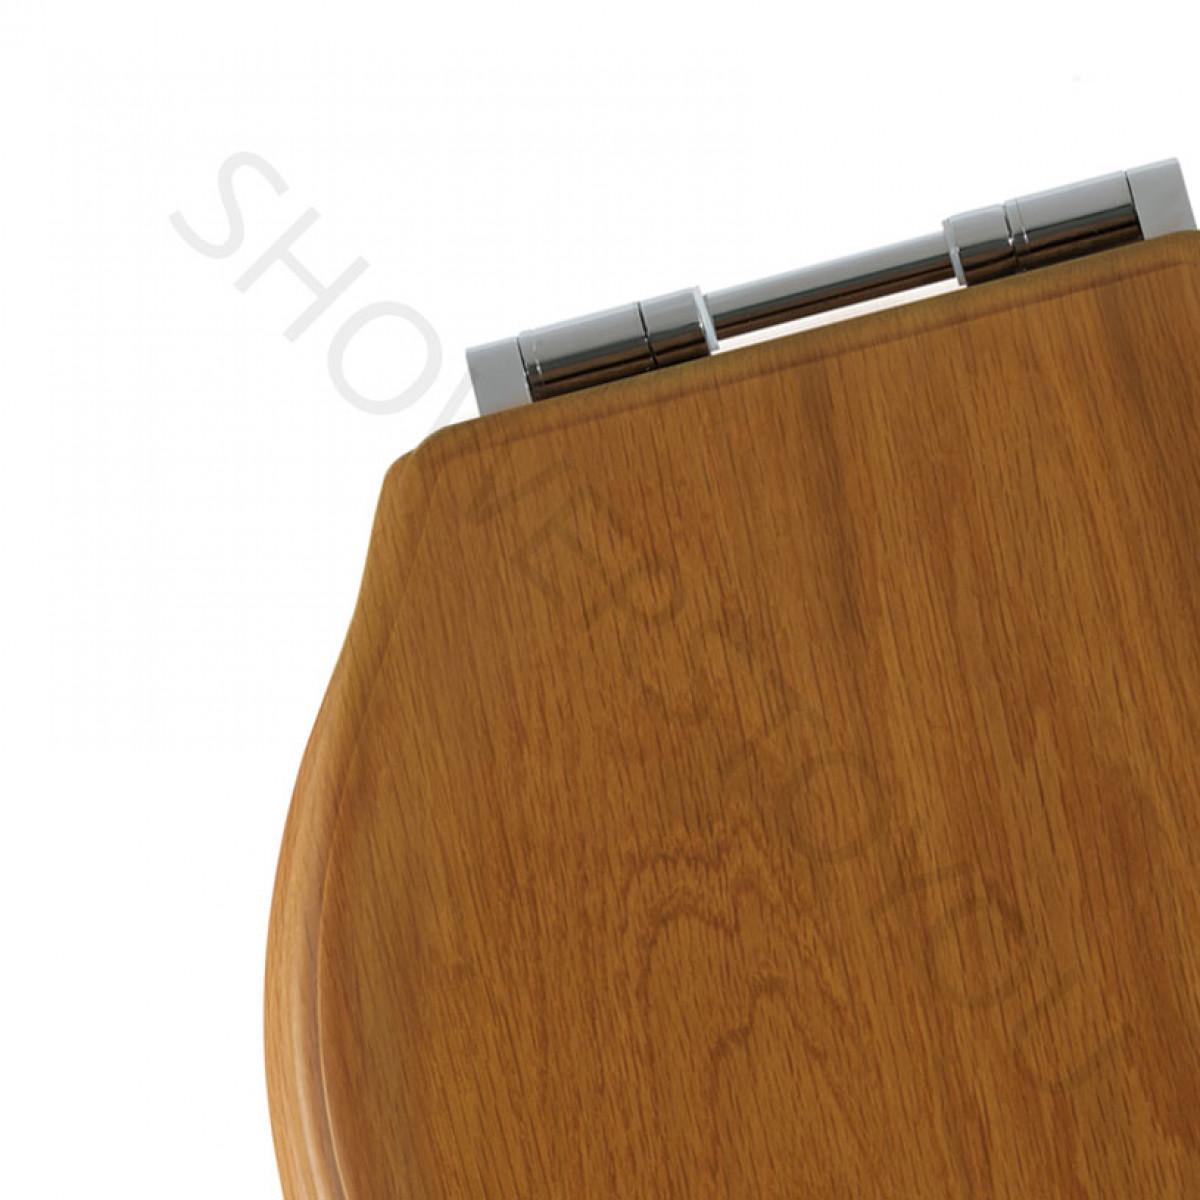 Roper Rhodes Greenwich Solid Wood Honey Oak Soft Close